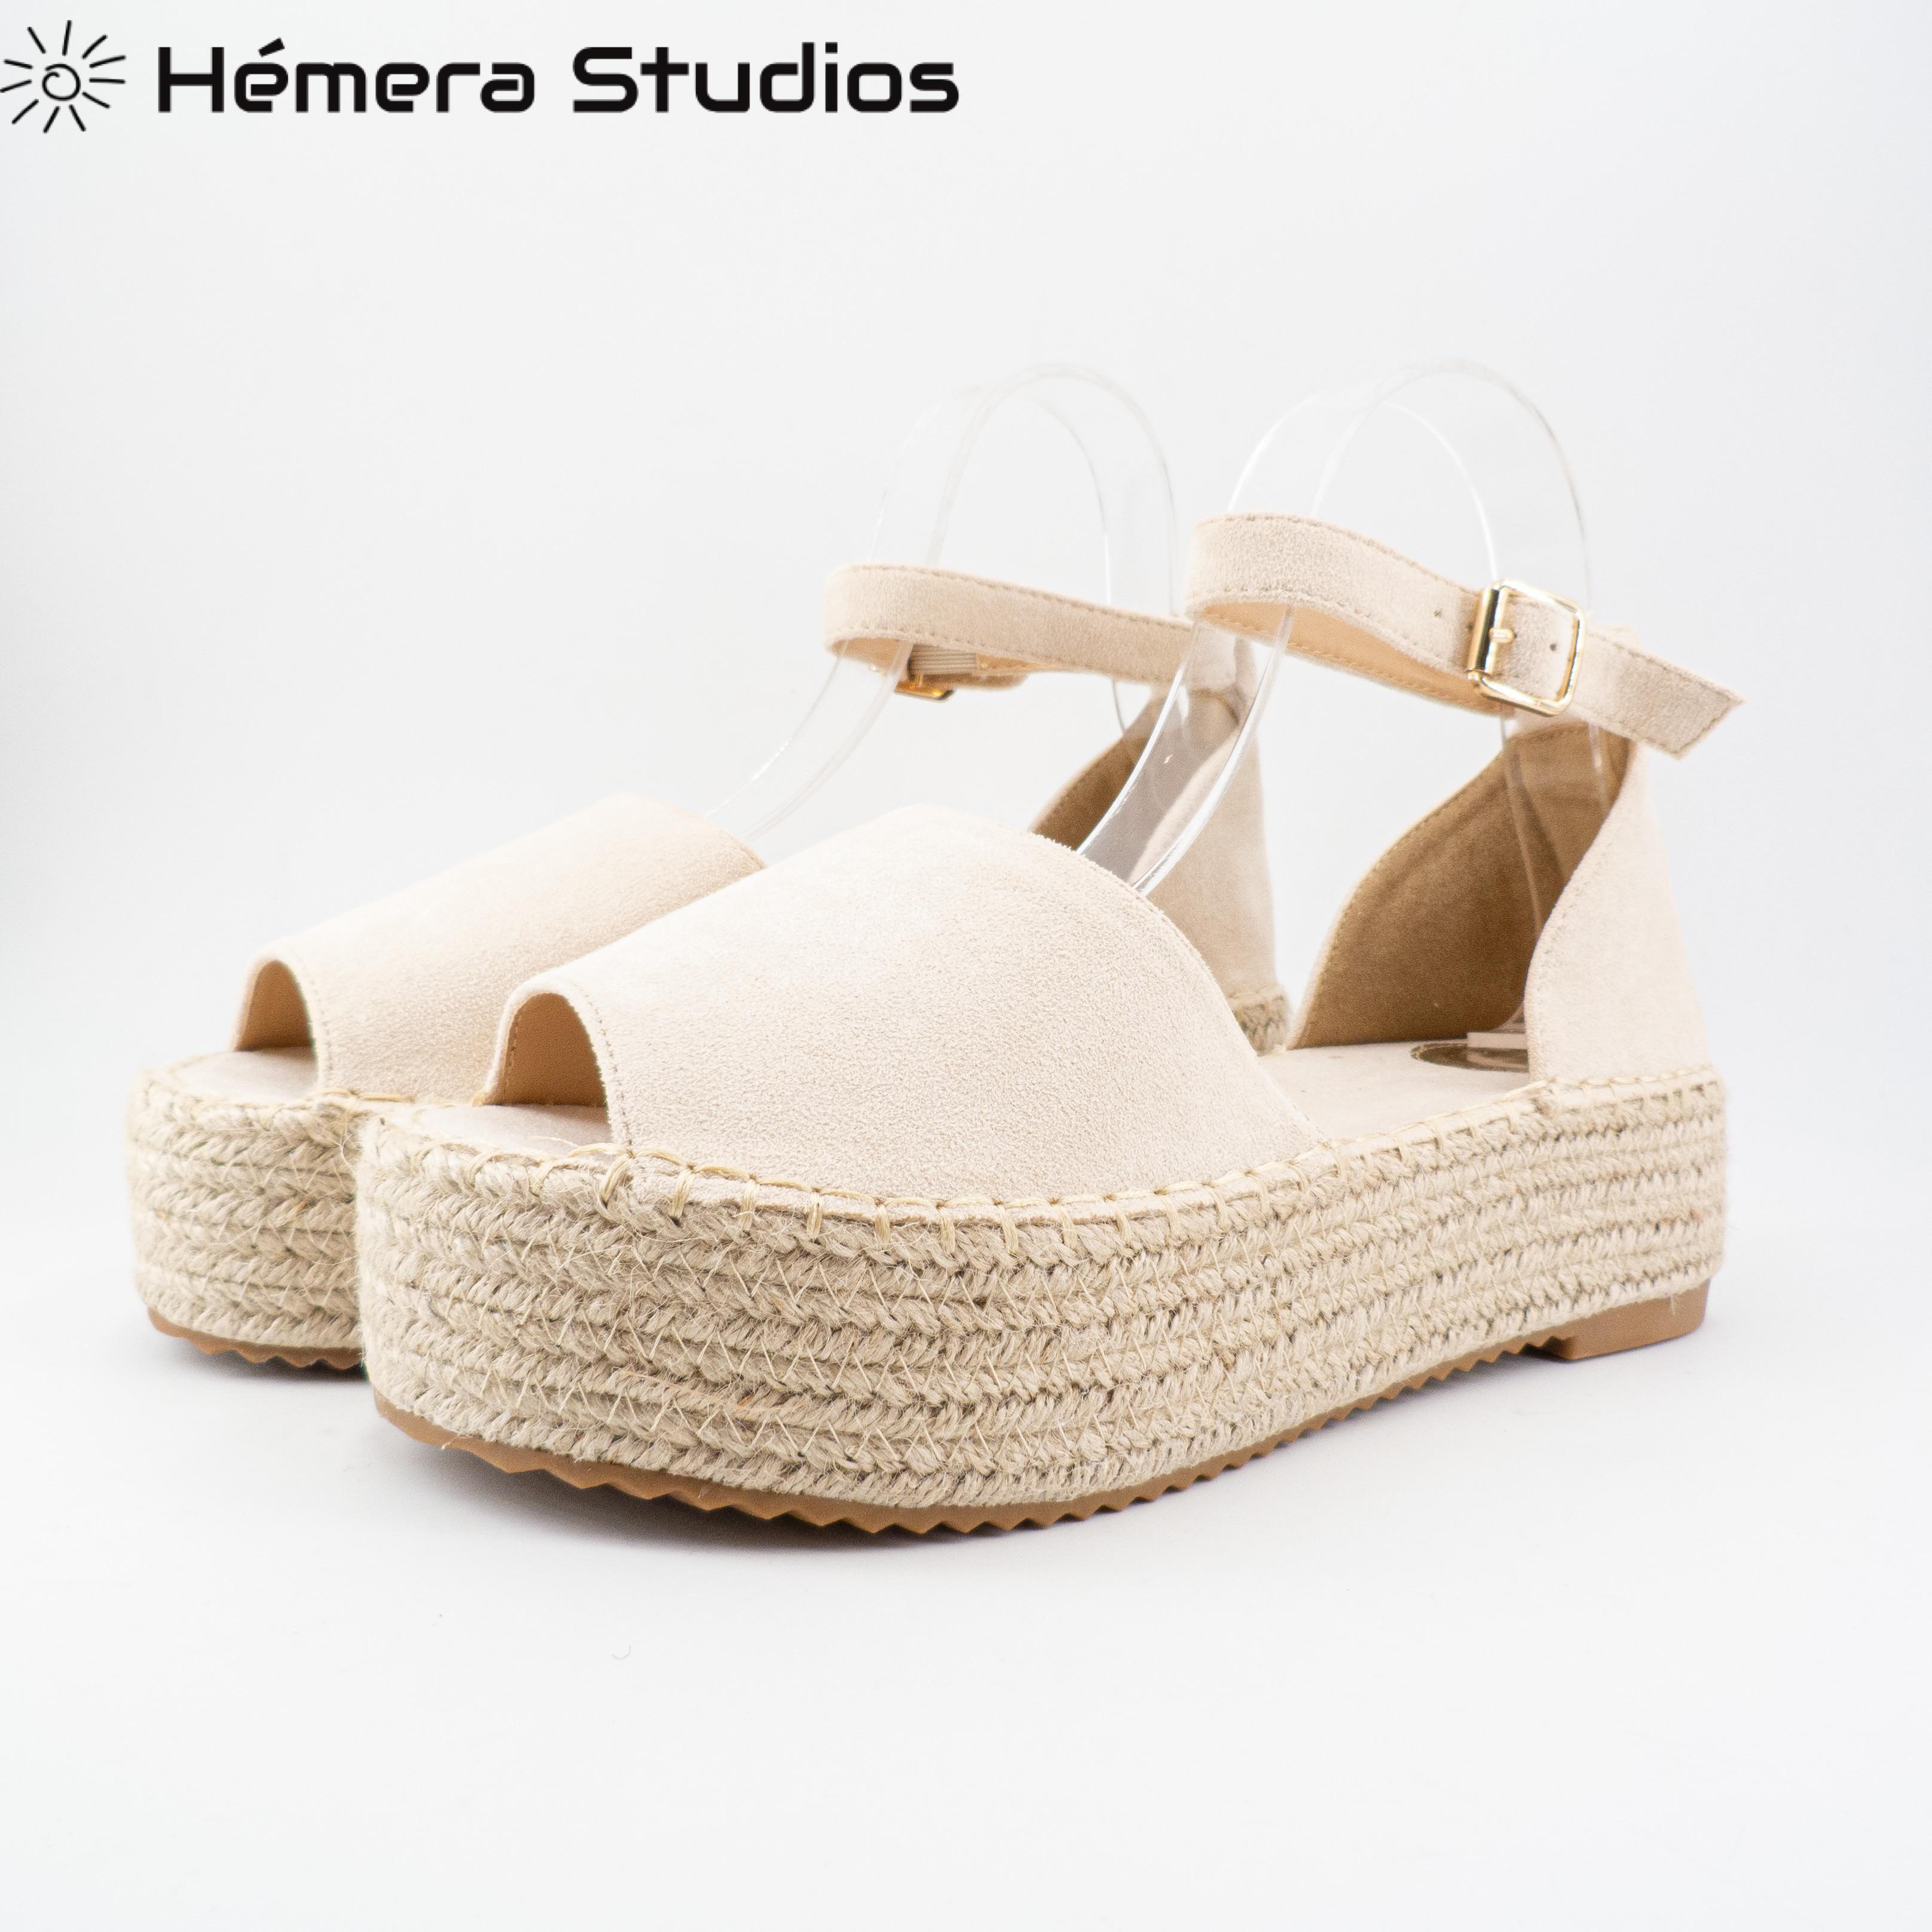 WOMAN Sandals 2020 SUMMER ESPARTOS BUCKLE ESPARTO Platform Wedge Espadrille Flat Beach Sandal Open Multicolor